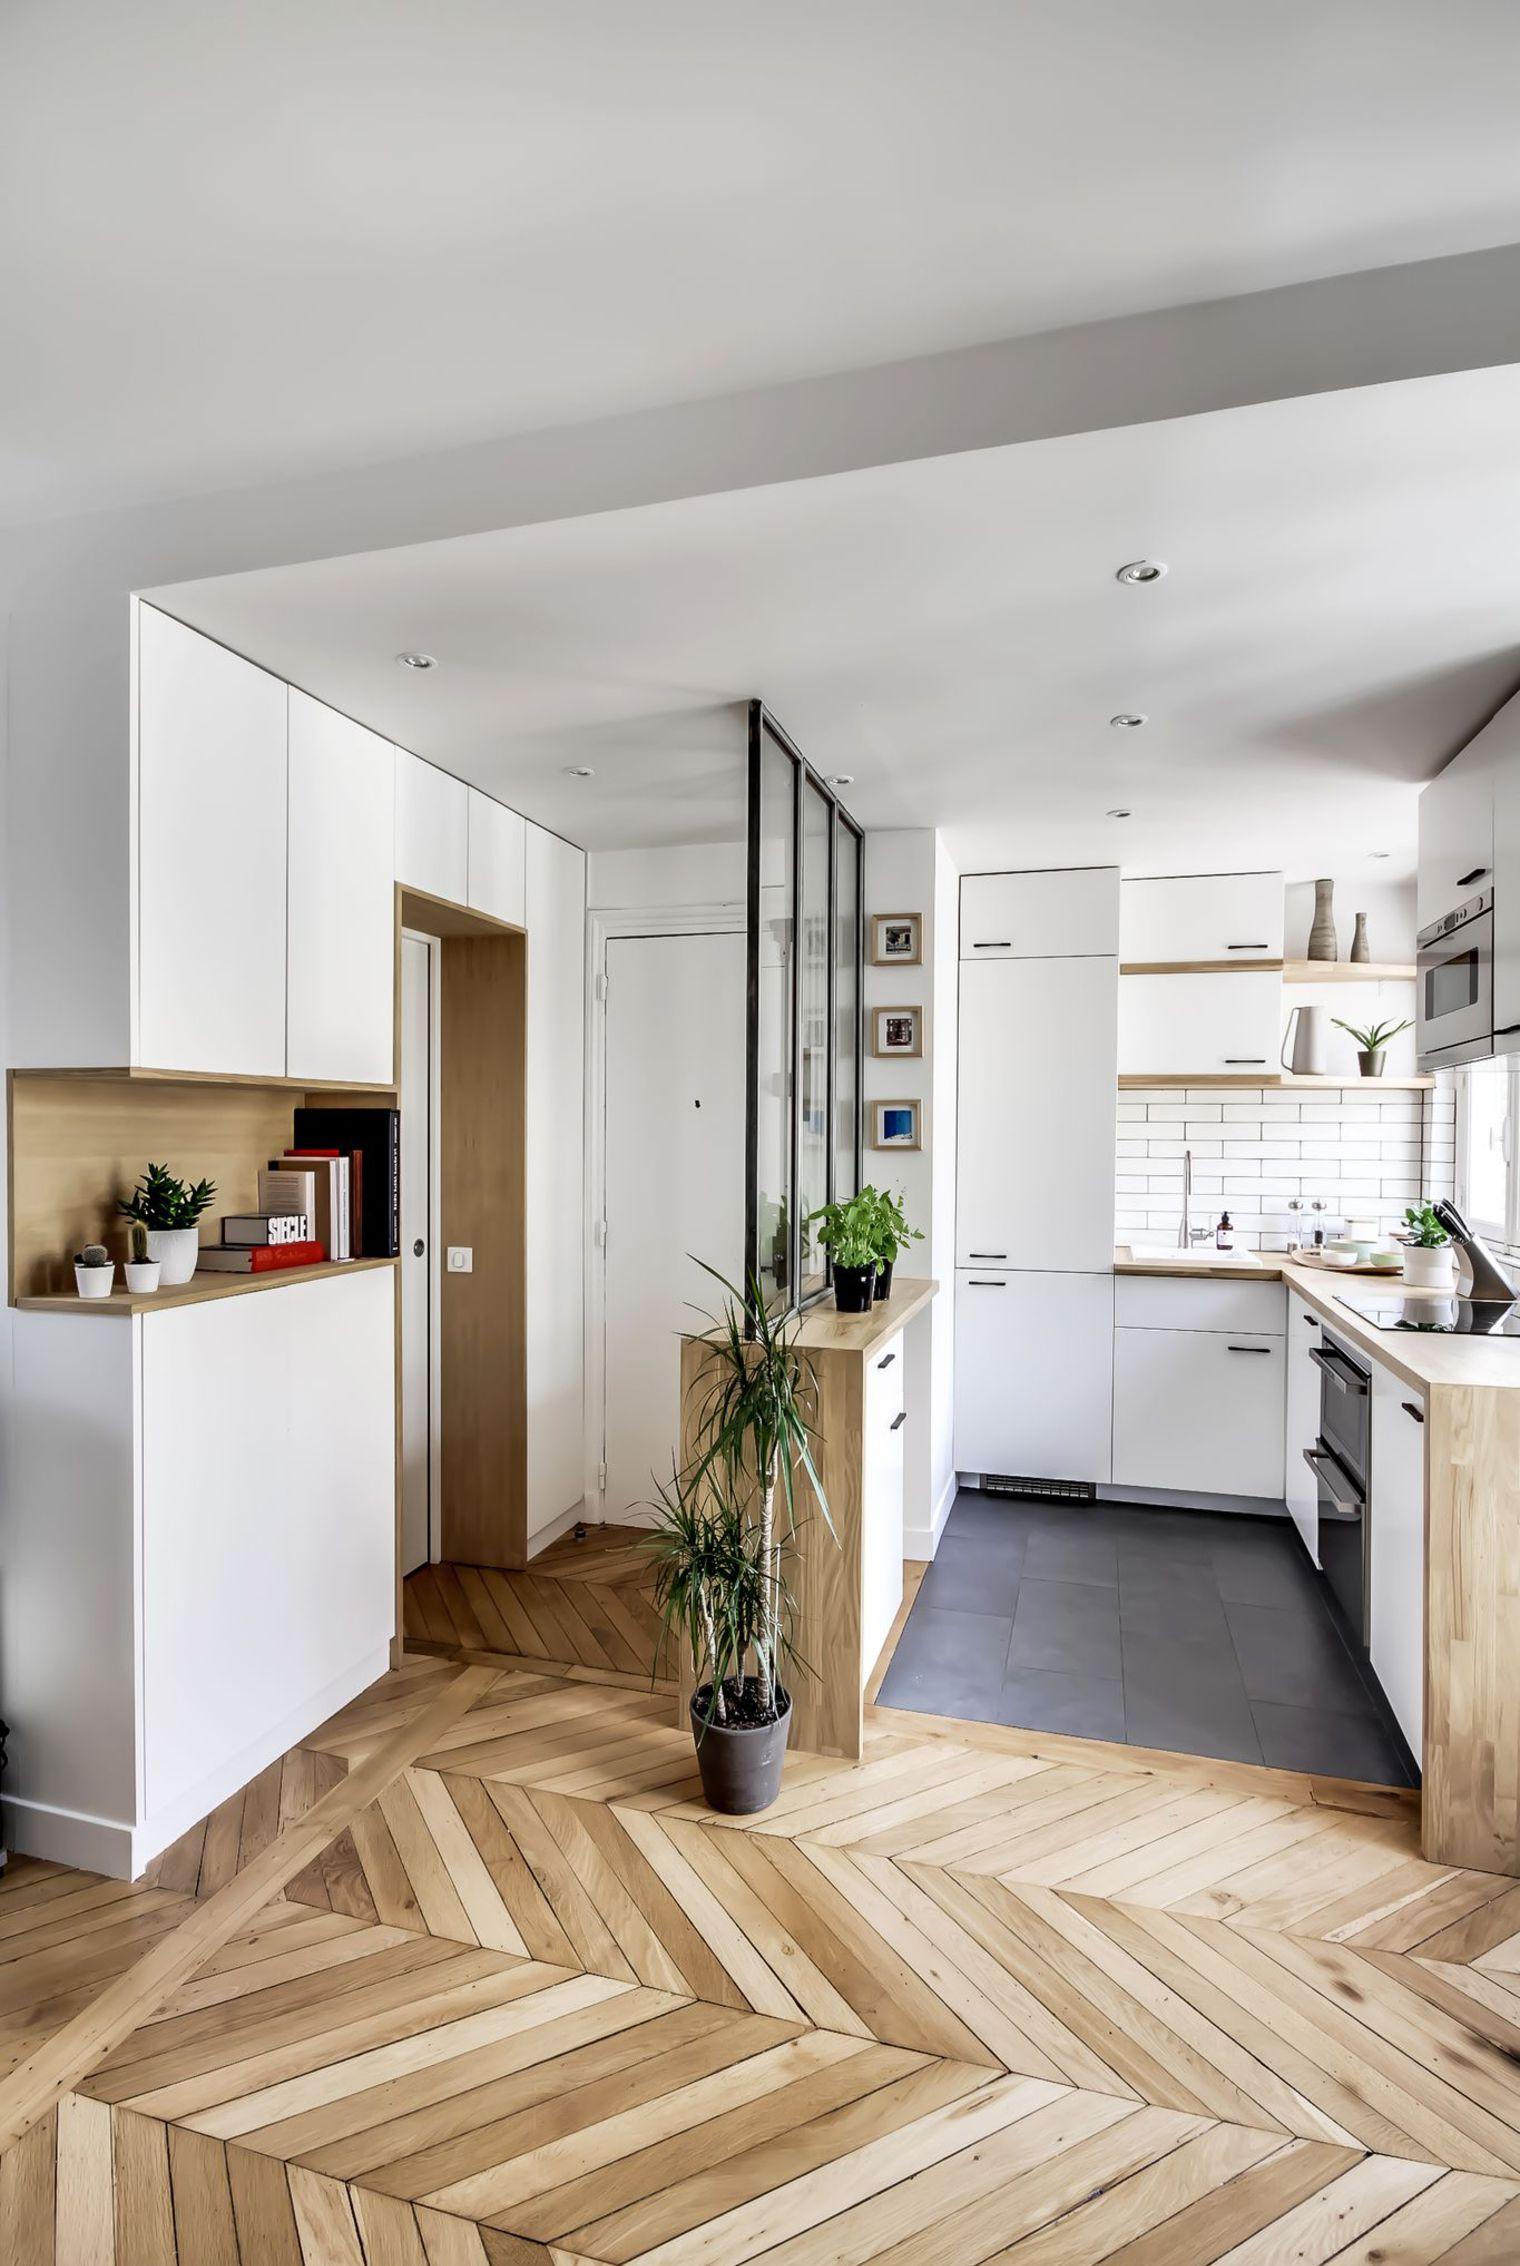 Кухня 7 кв м в квартире